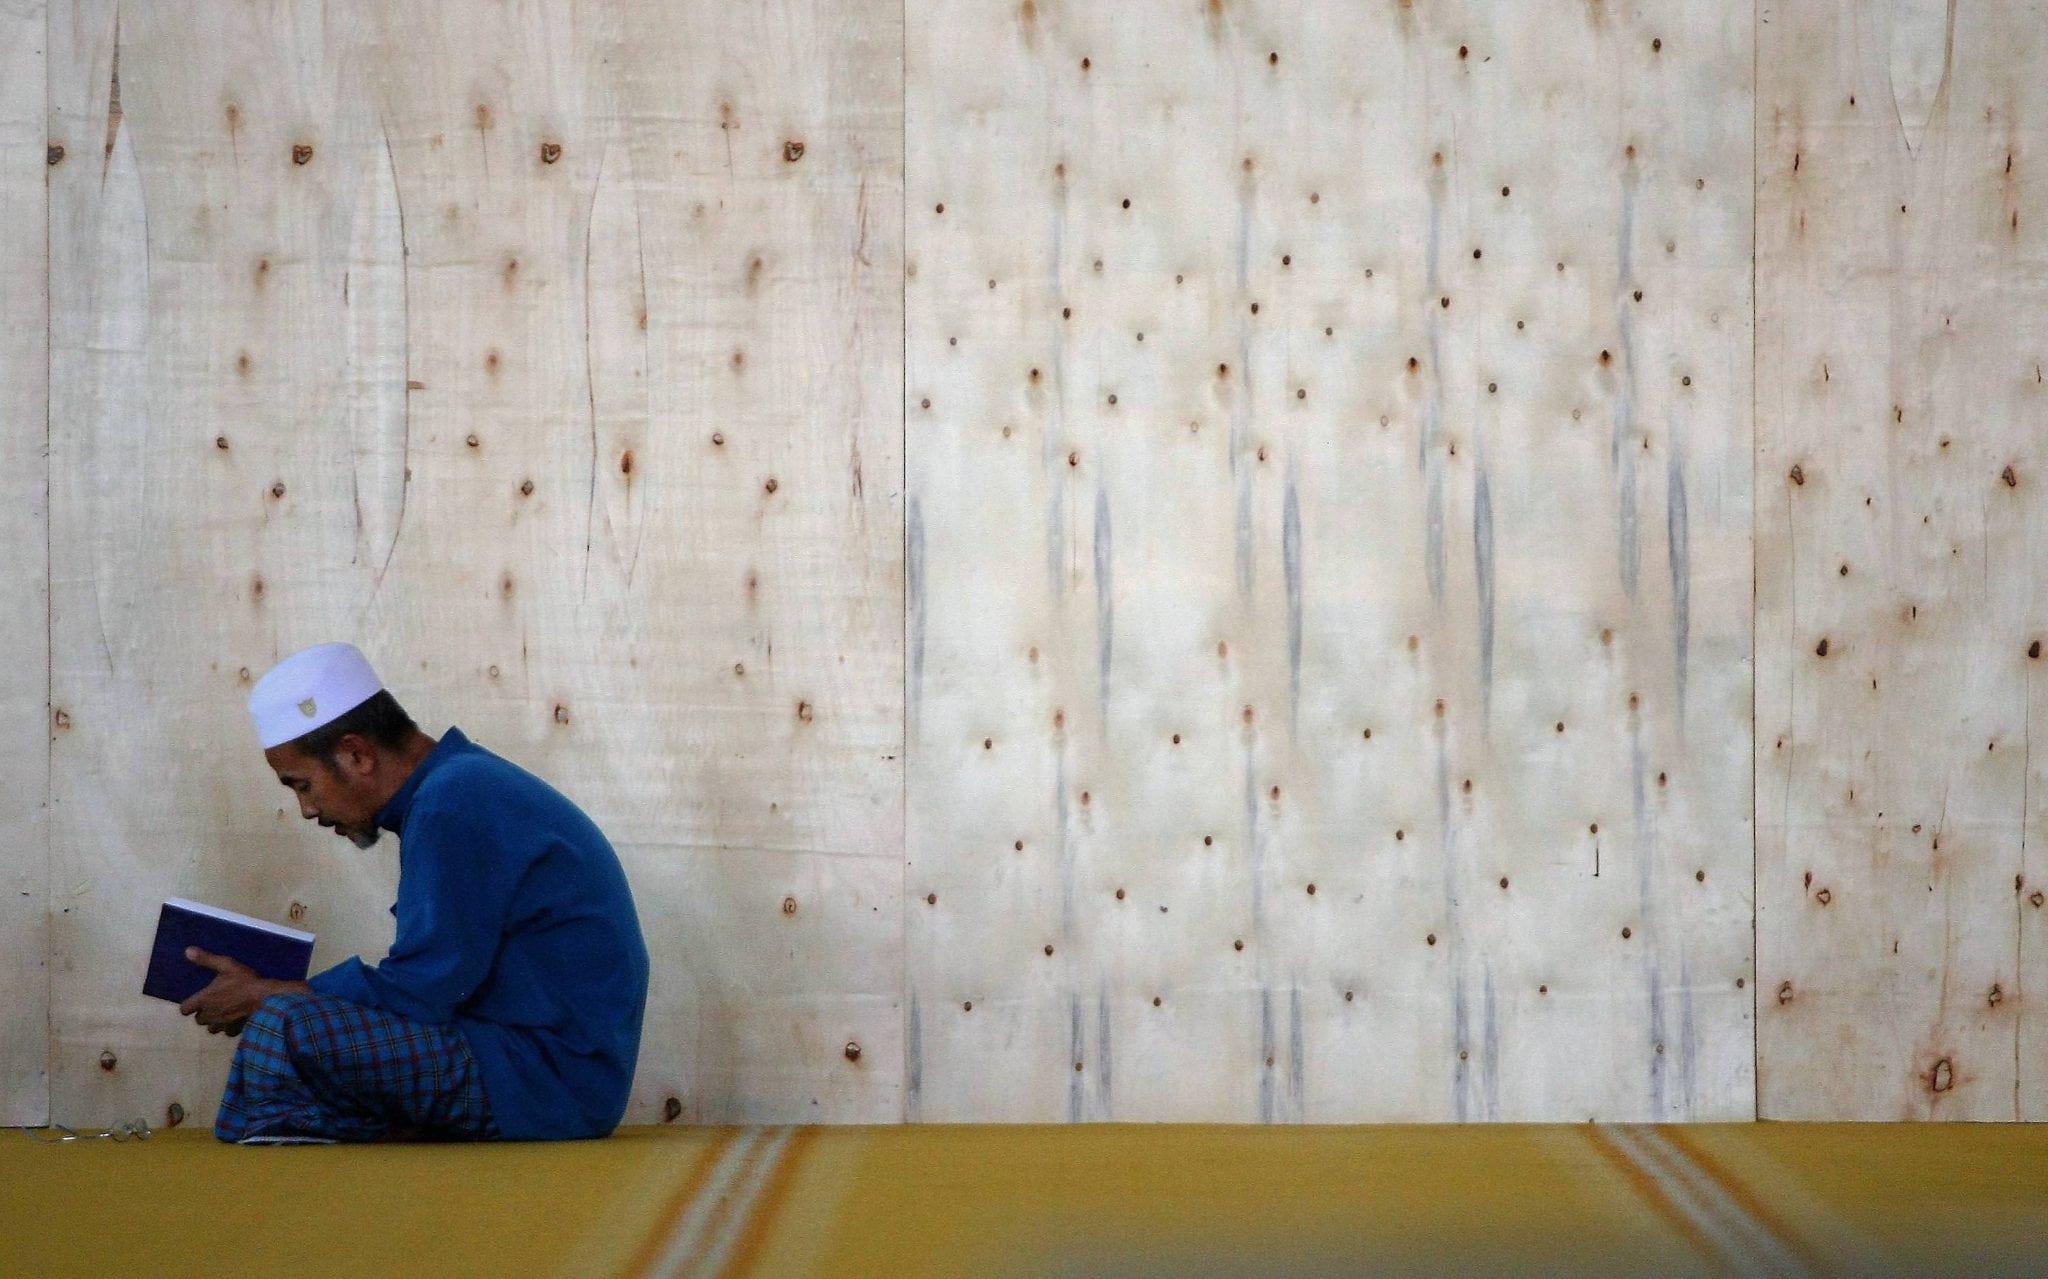 Man reading Quran learning student